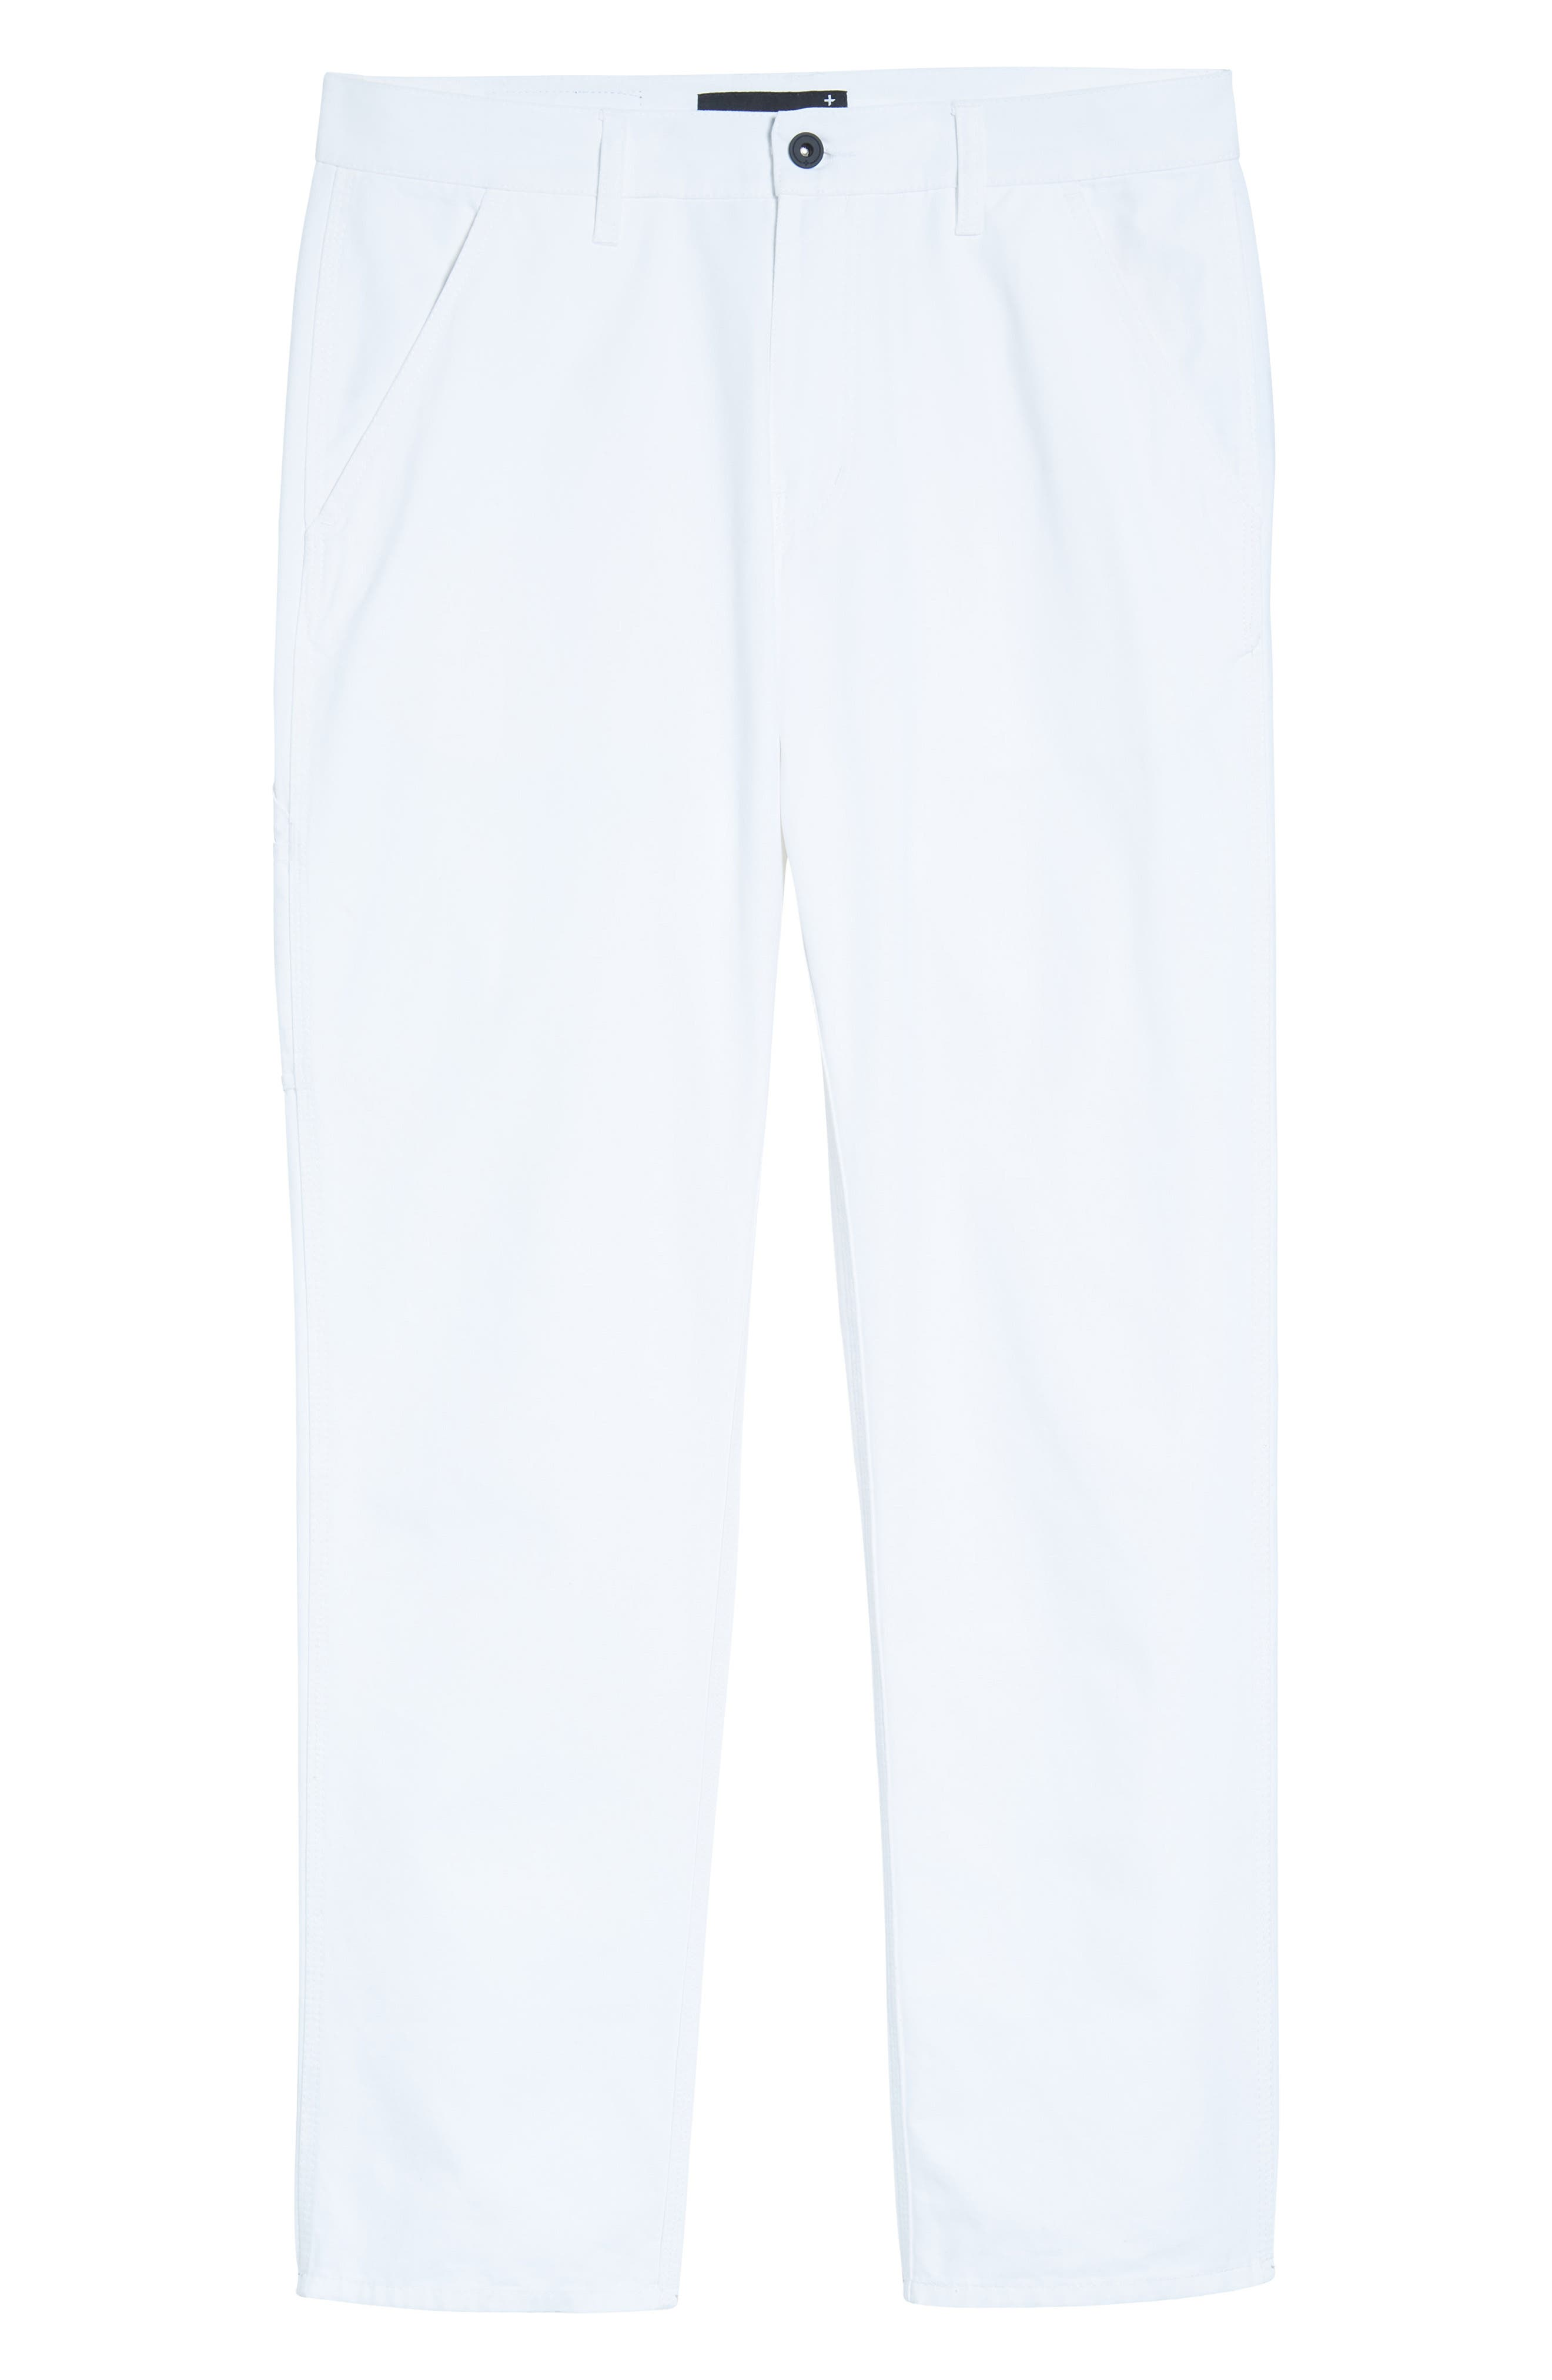 Westport Utility Pants,                         Main,                         color, White